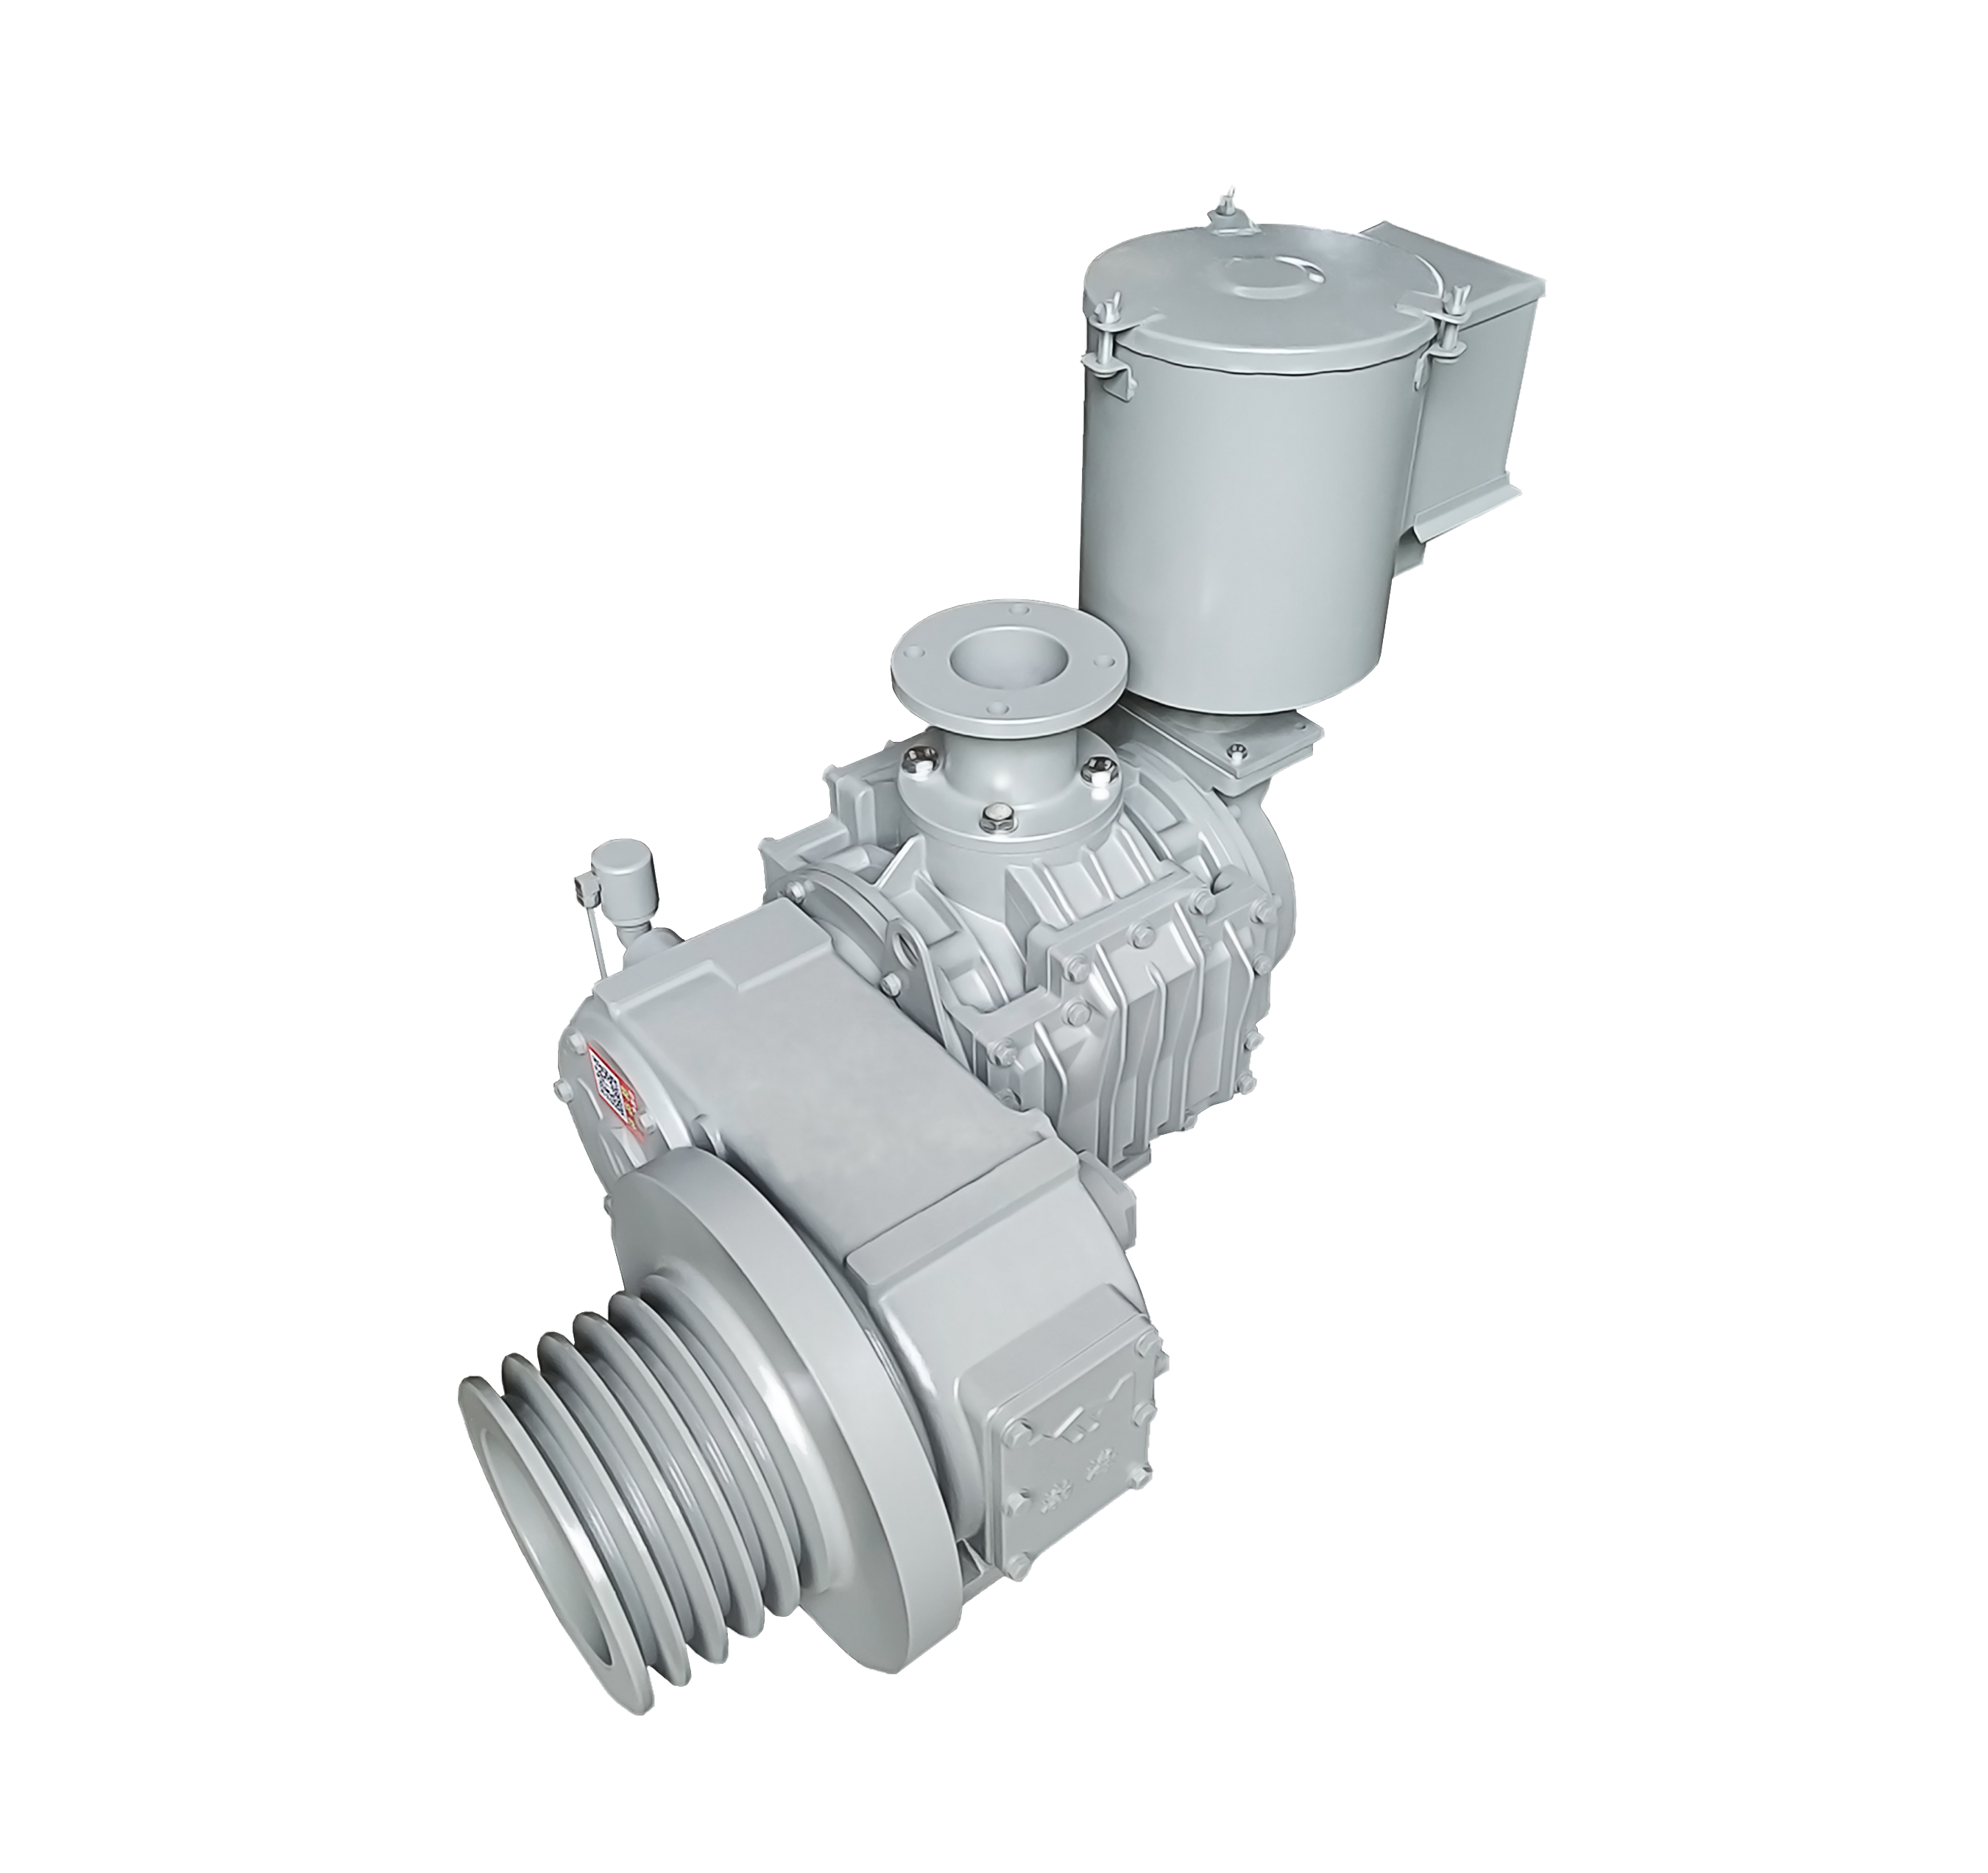 HYCW-12.5/2单缸铸铁机型空压机